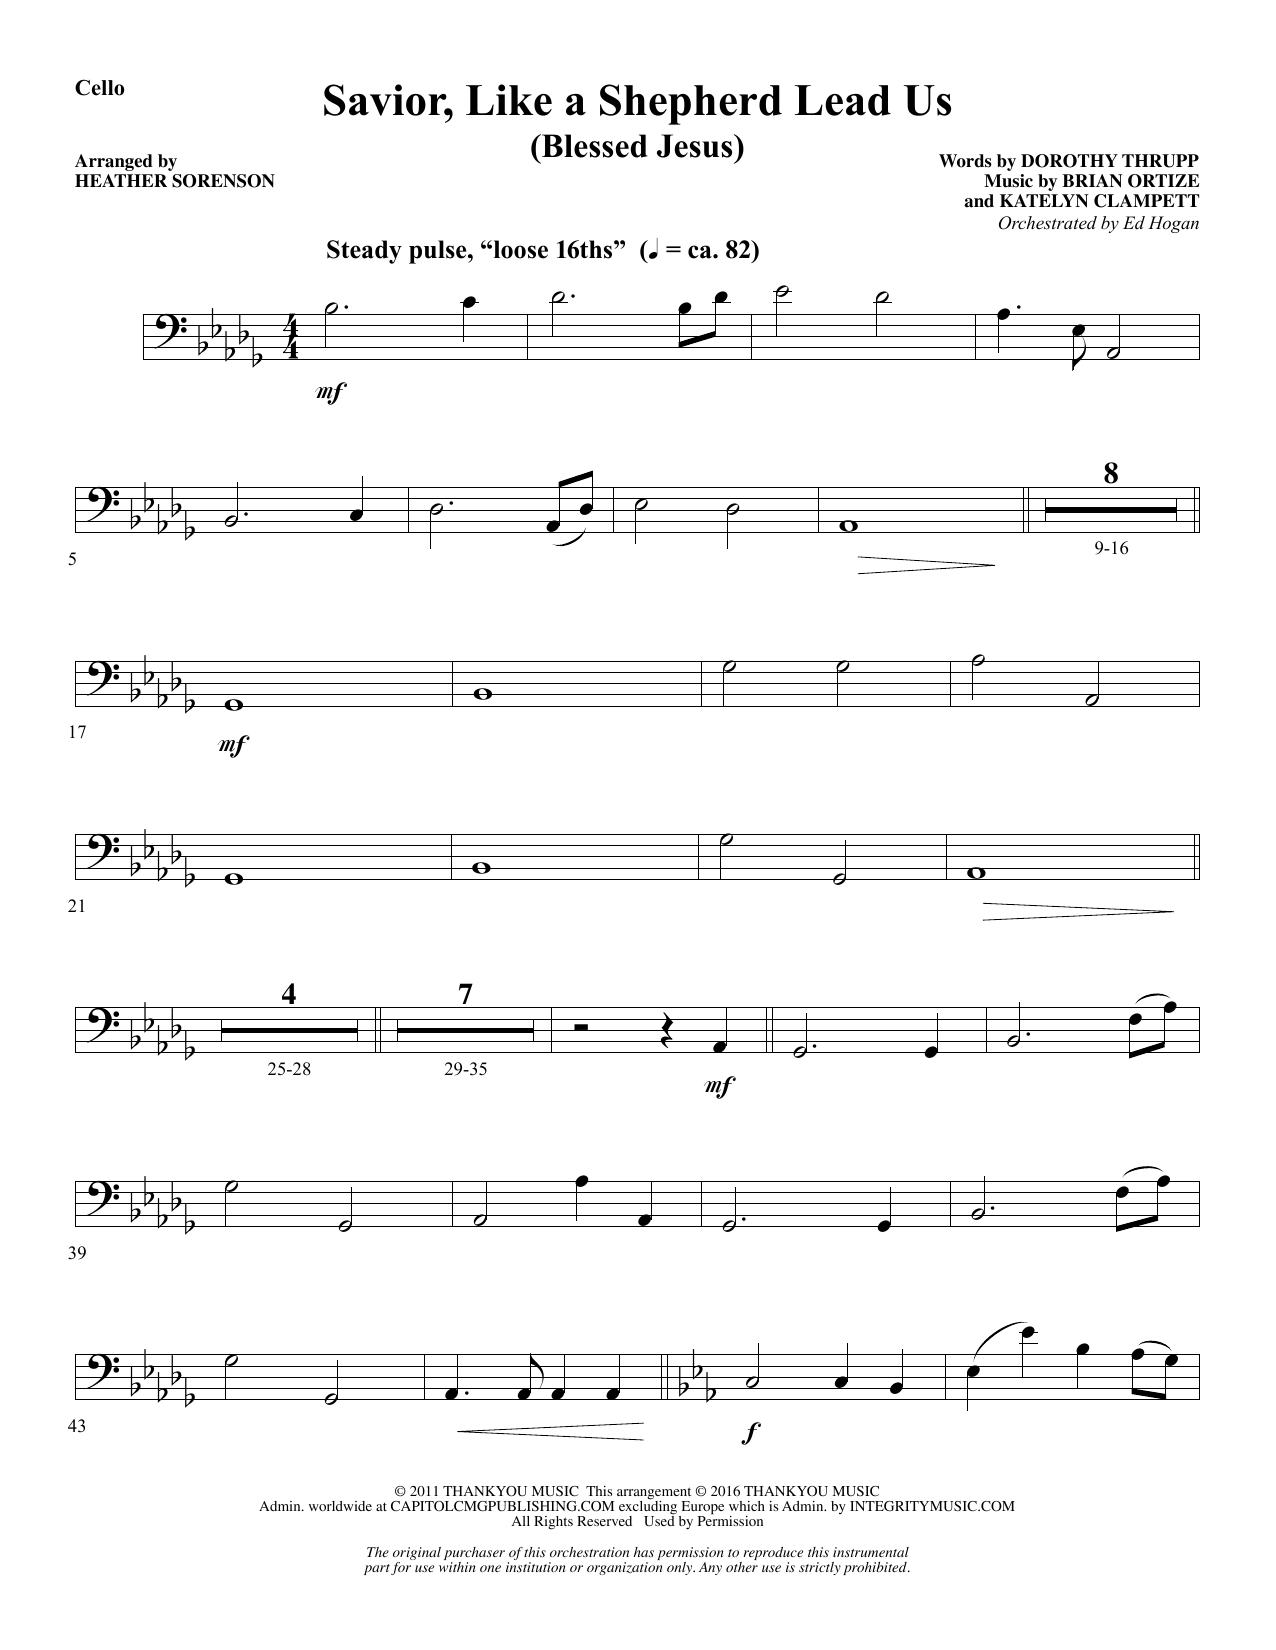 Savior, Like a Shepherd Lead Us (Blessed Jesus) - Cello Sheet Music